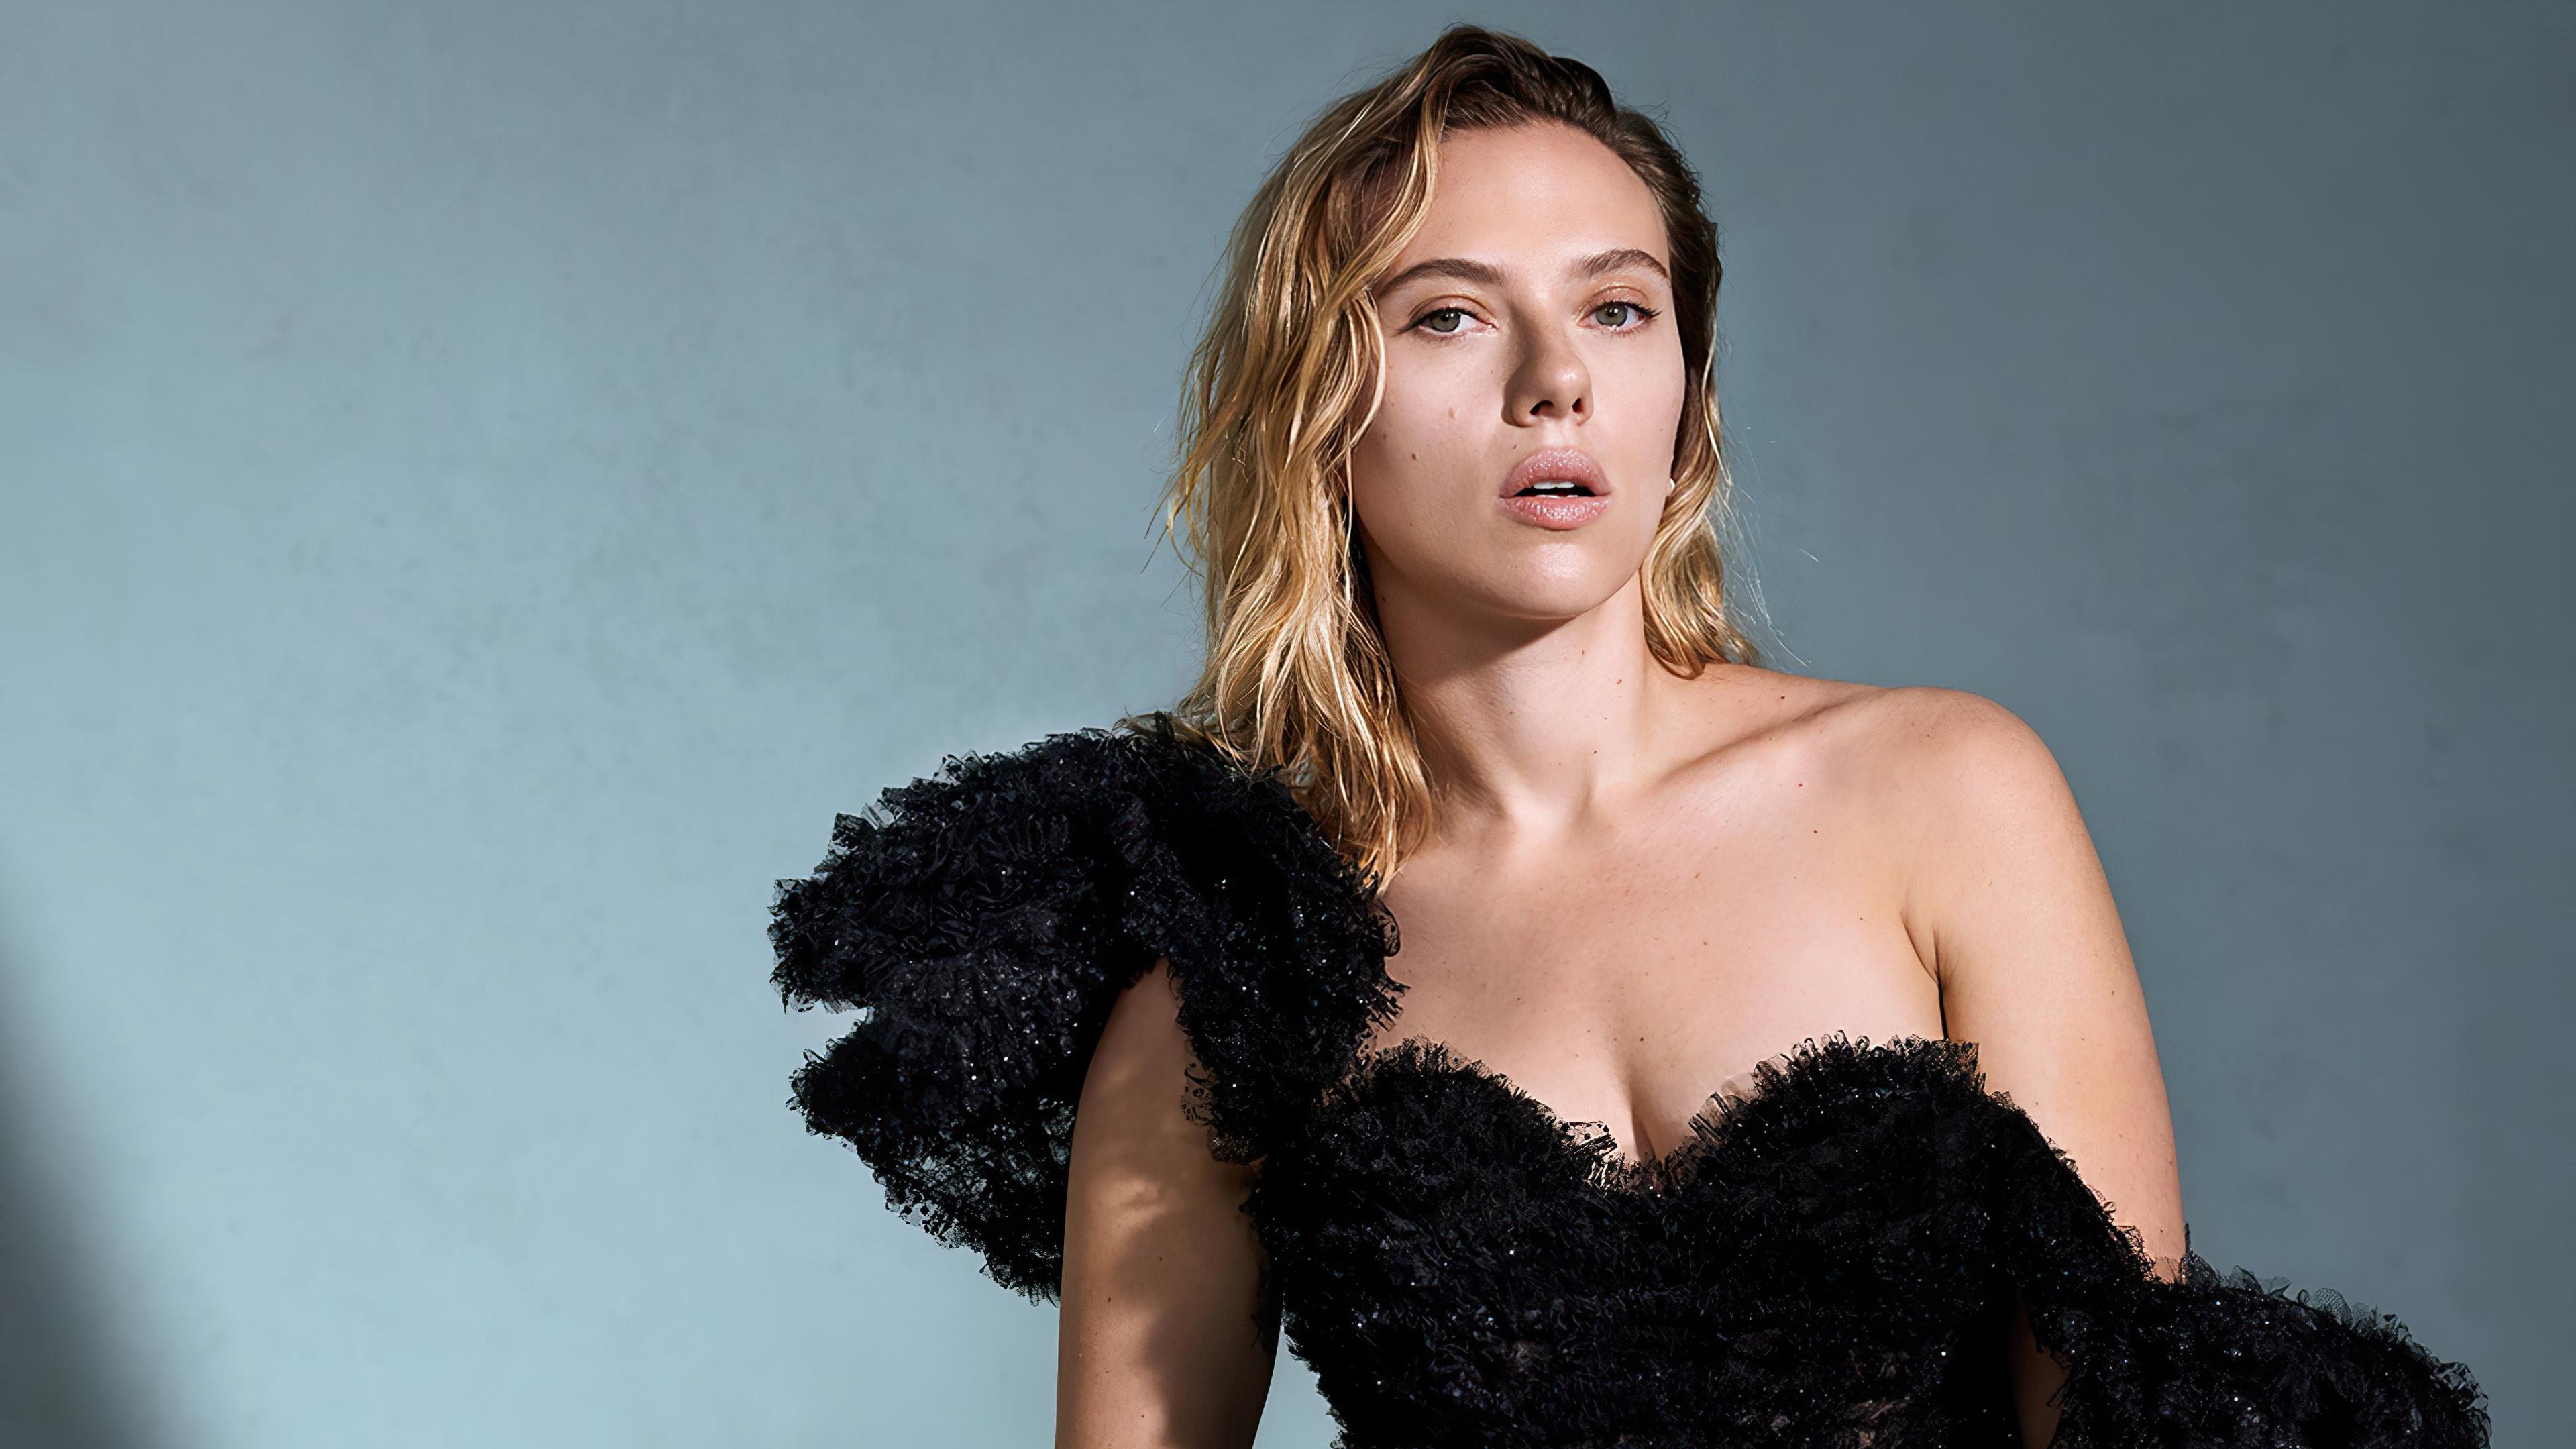 scarlett johansson 2020 4k 1596913181 - Scarlett Johansson 2020 4k -